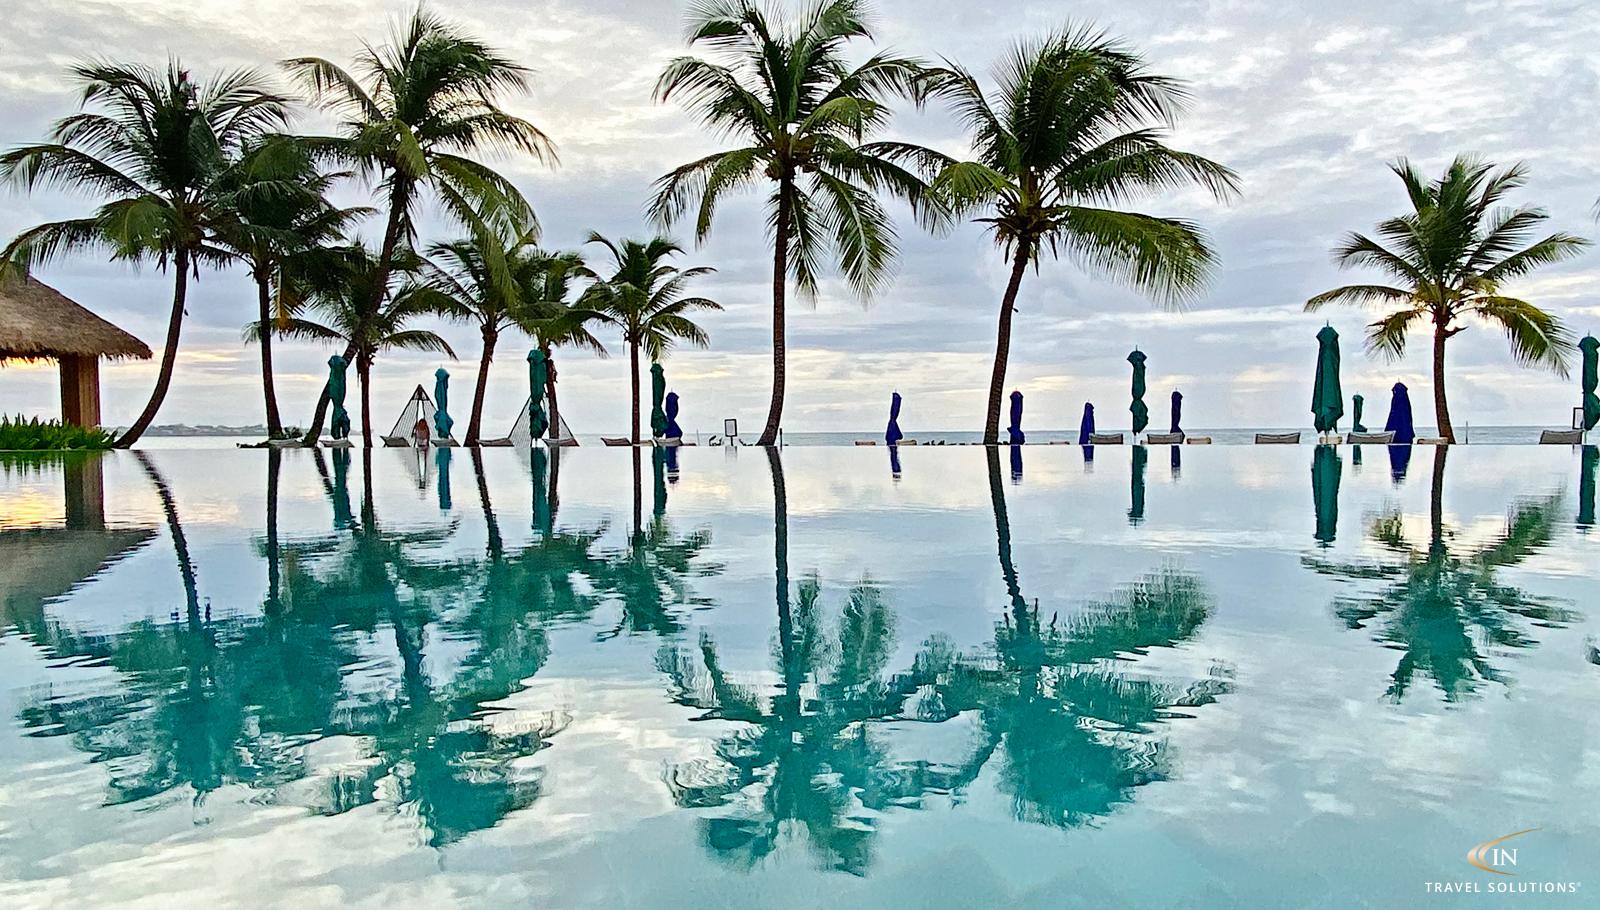 Infinity Pool at Sandals Royal Barbados